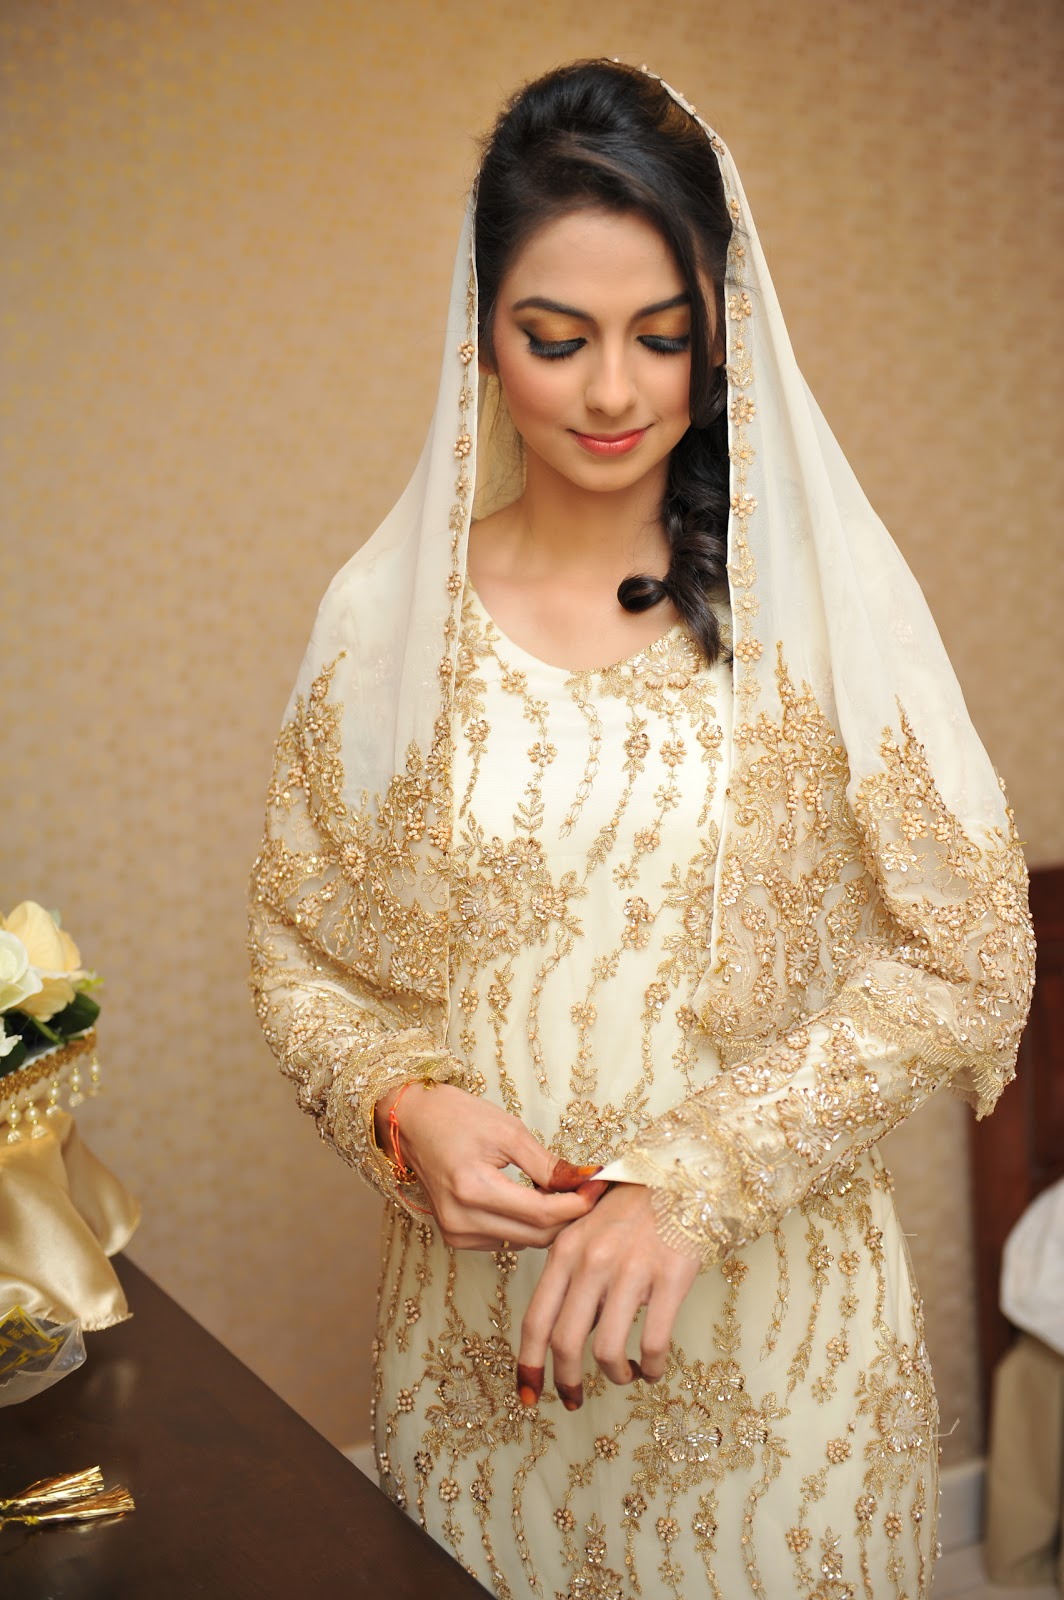 weddingdressesforrent blogspot wedding dresses for rent Front view of the dress